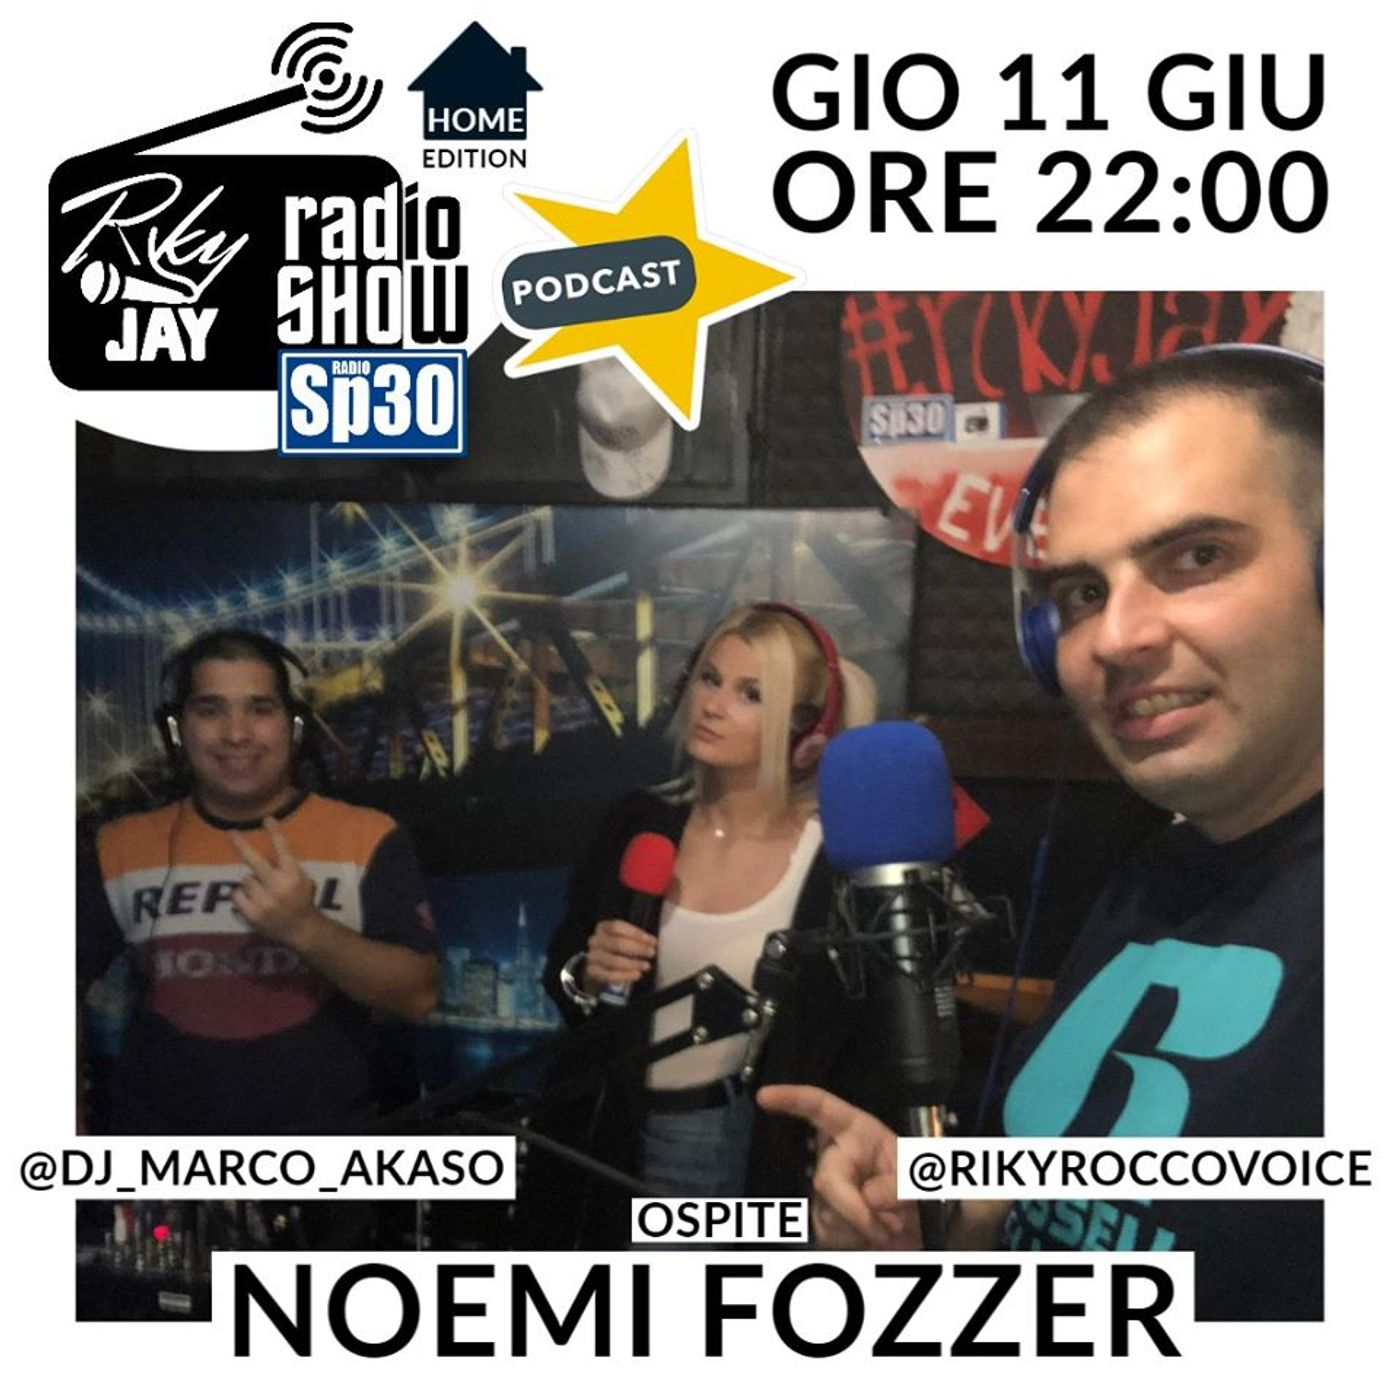 RikyJay Radio Show - #34 - Home Edition - Ospite Noemi Fozzer